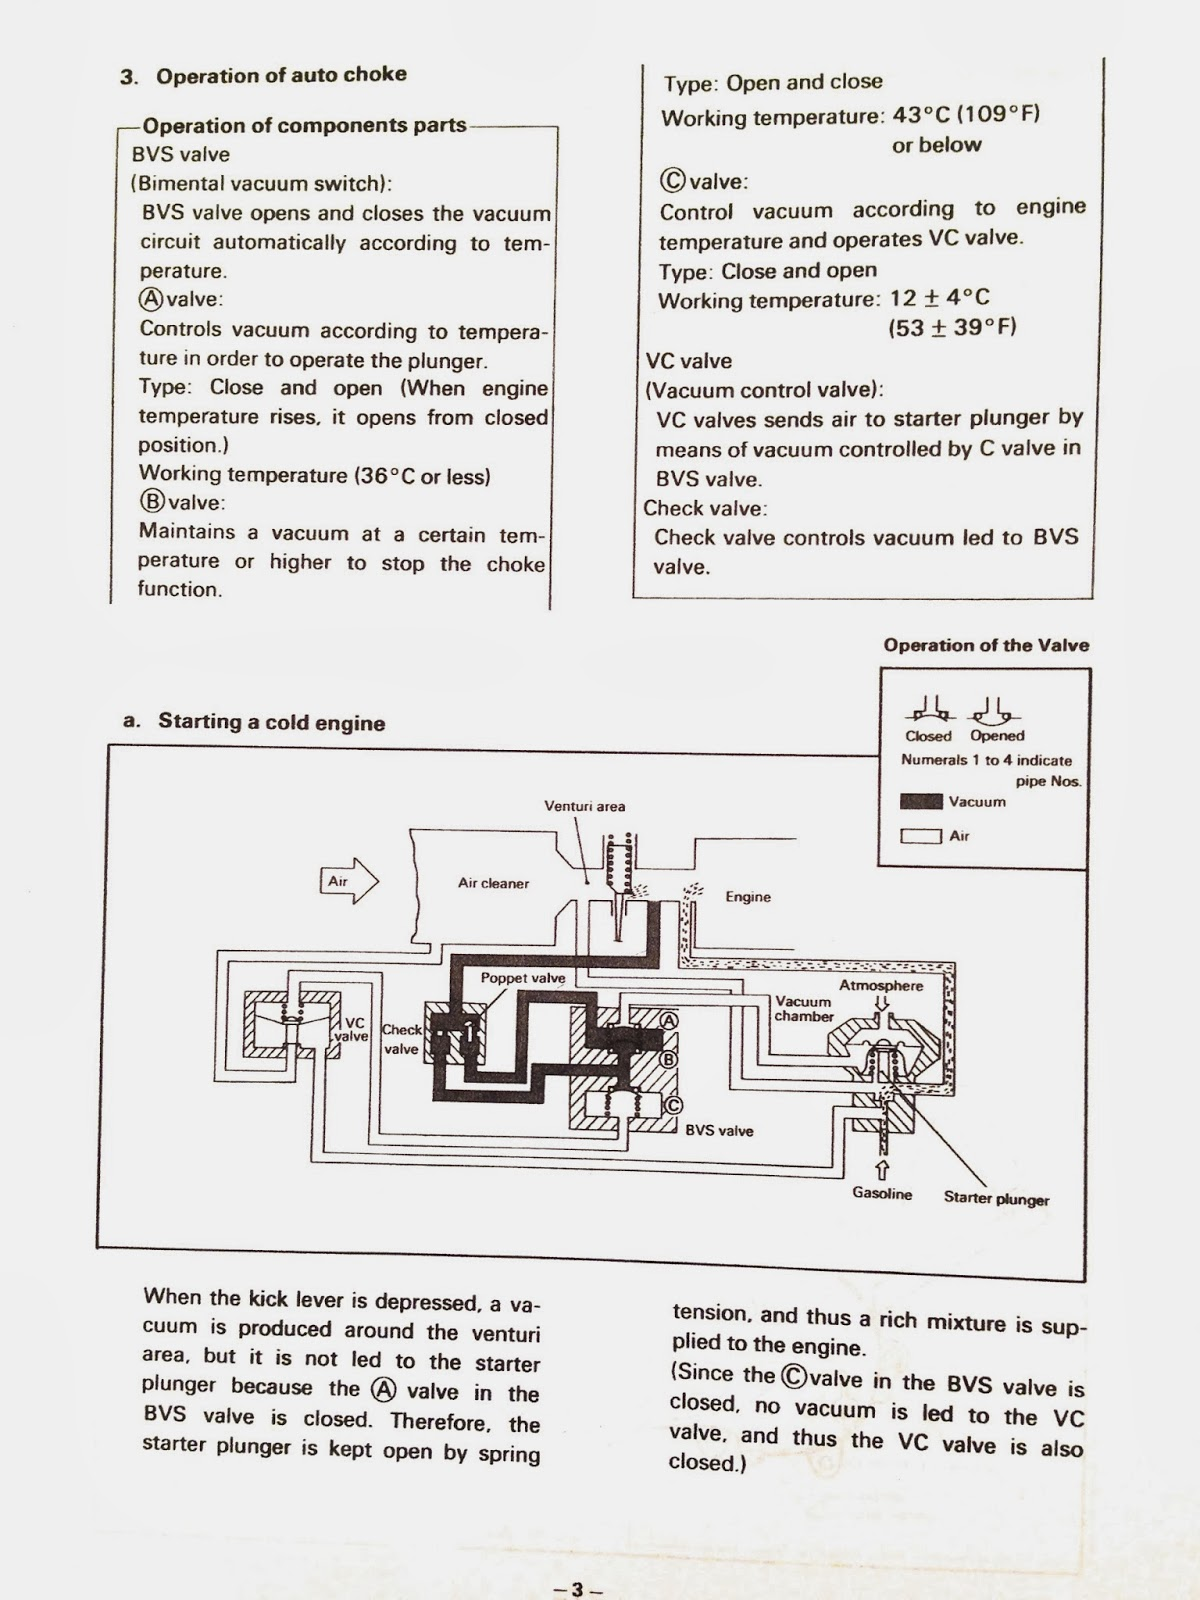 yamaha lc50 yamaha lc50 service manual yamaha power valve wiring lc 50 service manual in jpg format